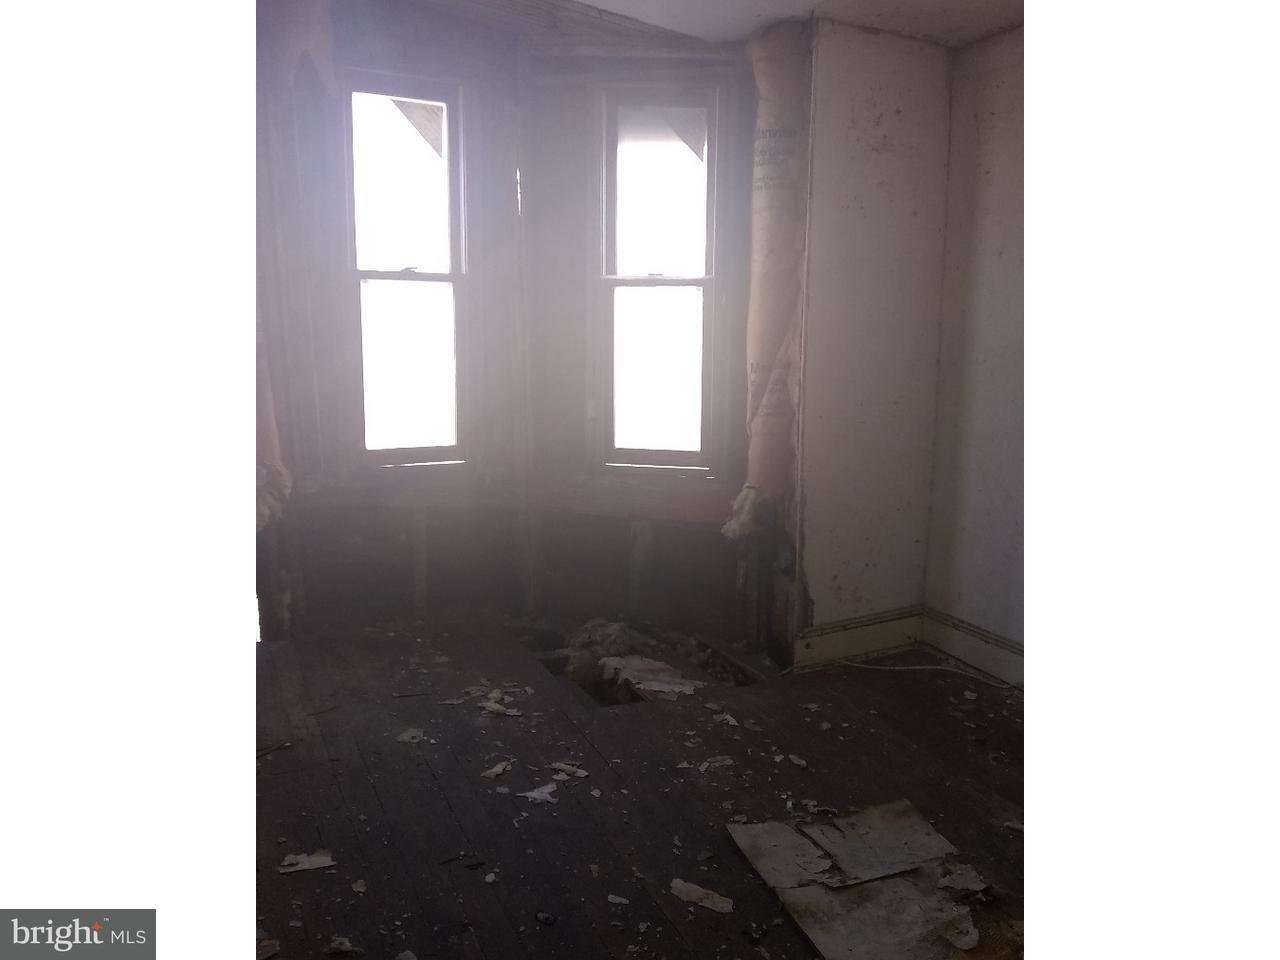 222 N Avondale Philadelphia, PA 19139